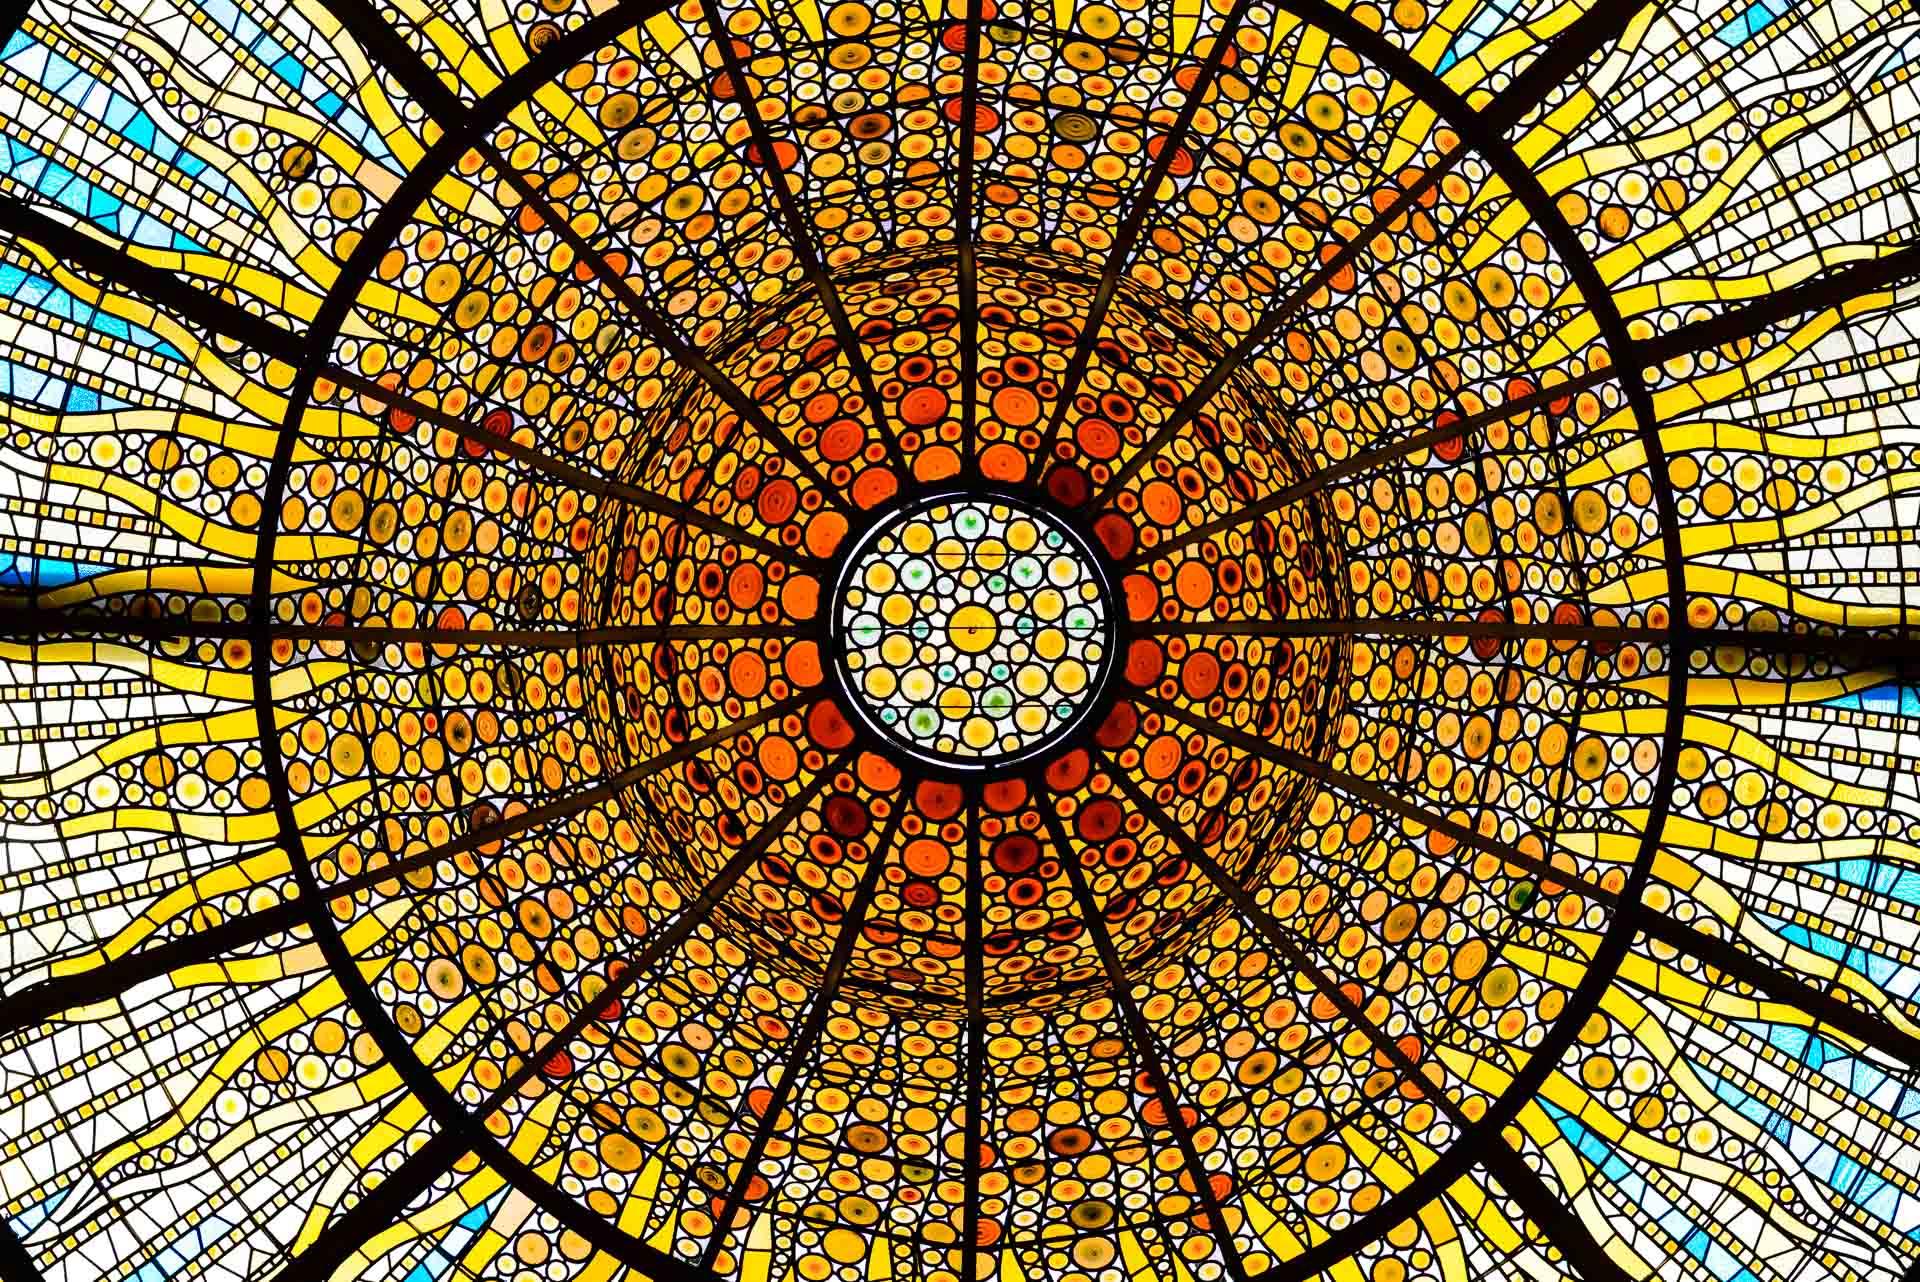 palau de musica ceiling